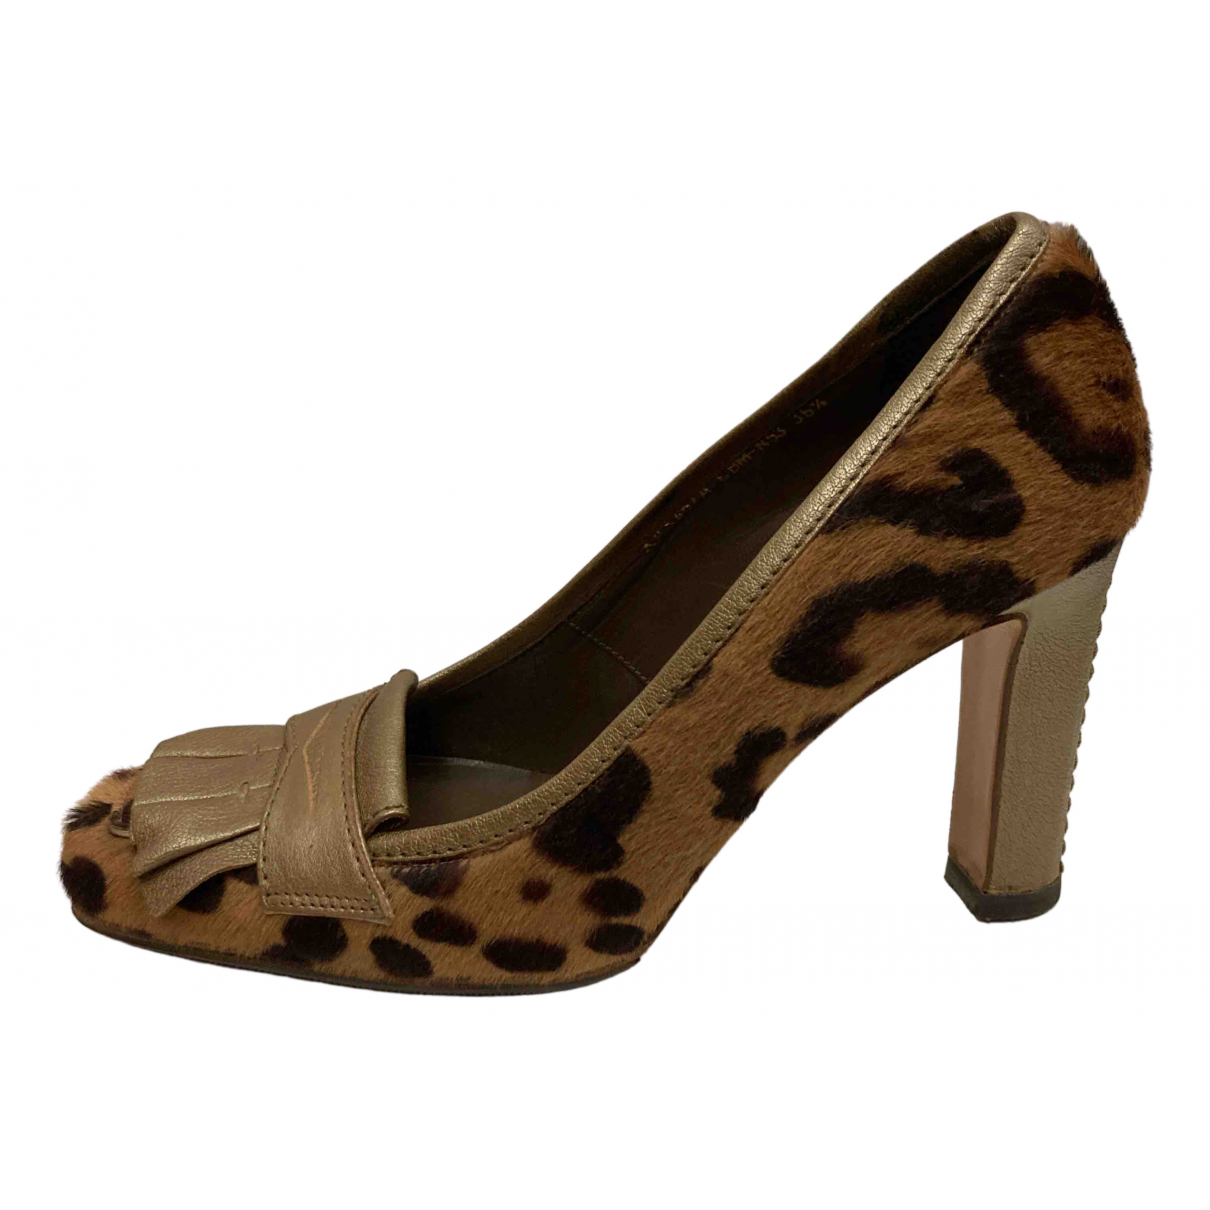 Valentino Garavani N Multicolour Pony-style calfskin Heels for Women 36.5 EU